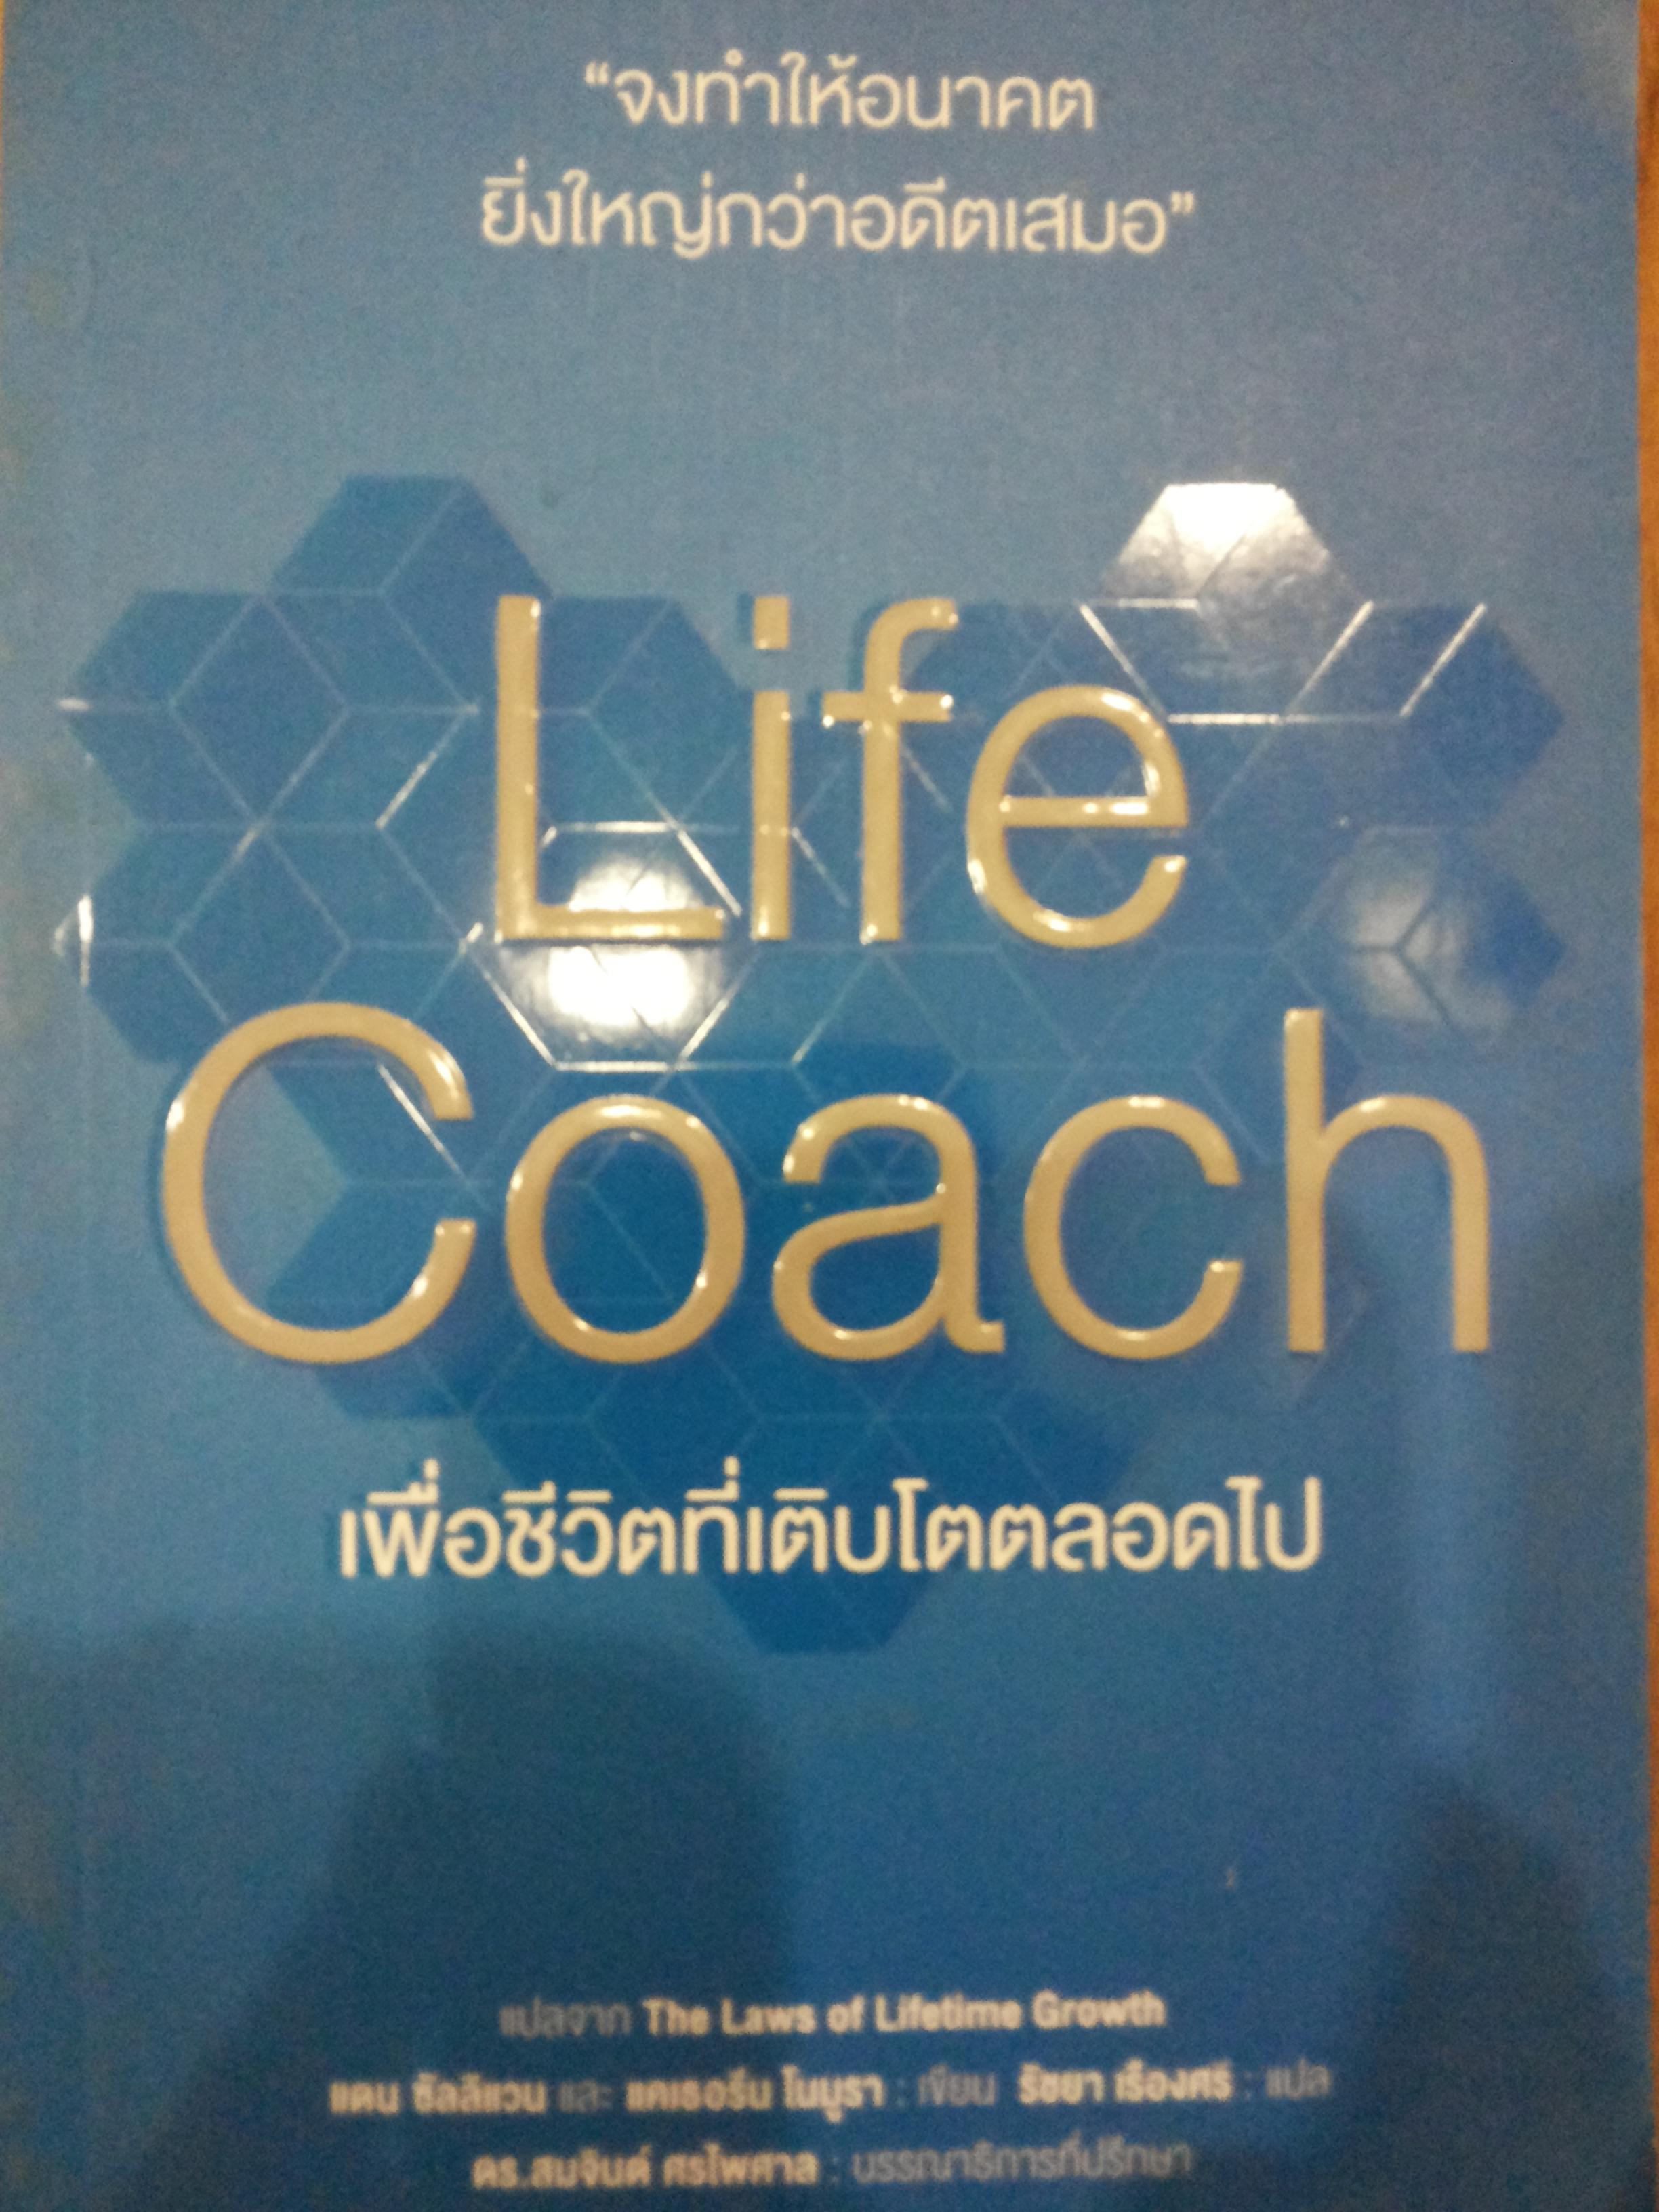 Life Coach เพื่อชีวิตที่เติบโตตลอดไป